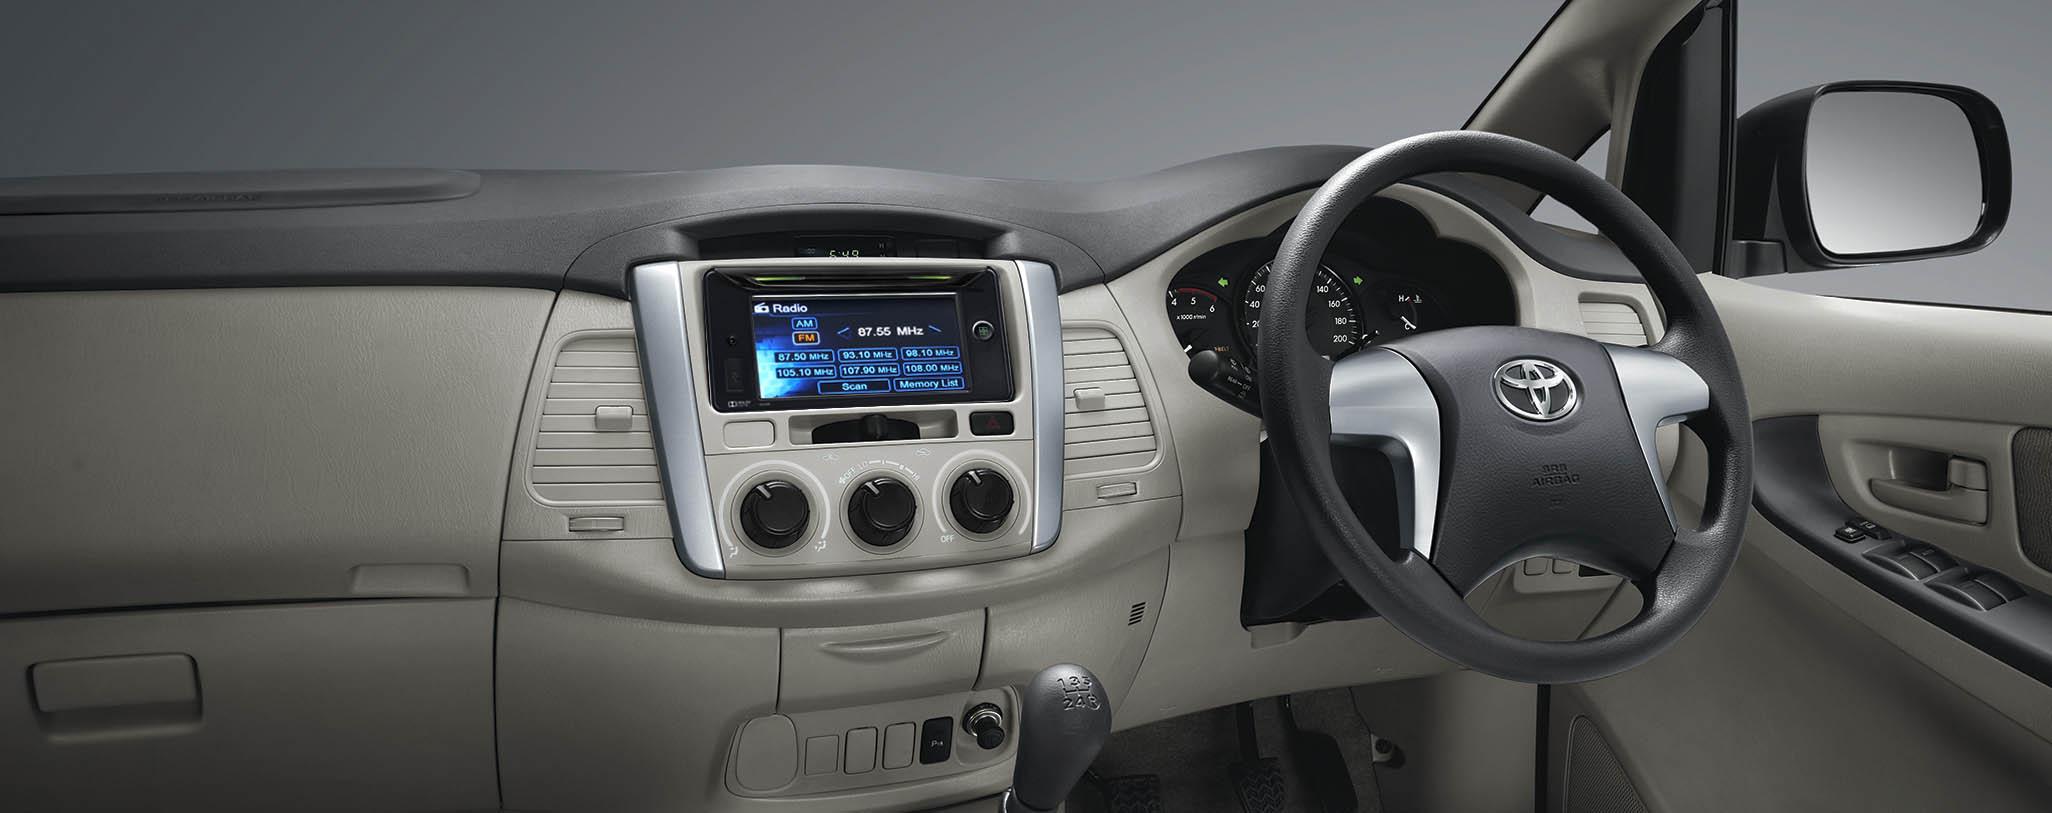 type new harga amp spec toyota new kijang inova 2012 new model kijang